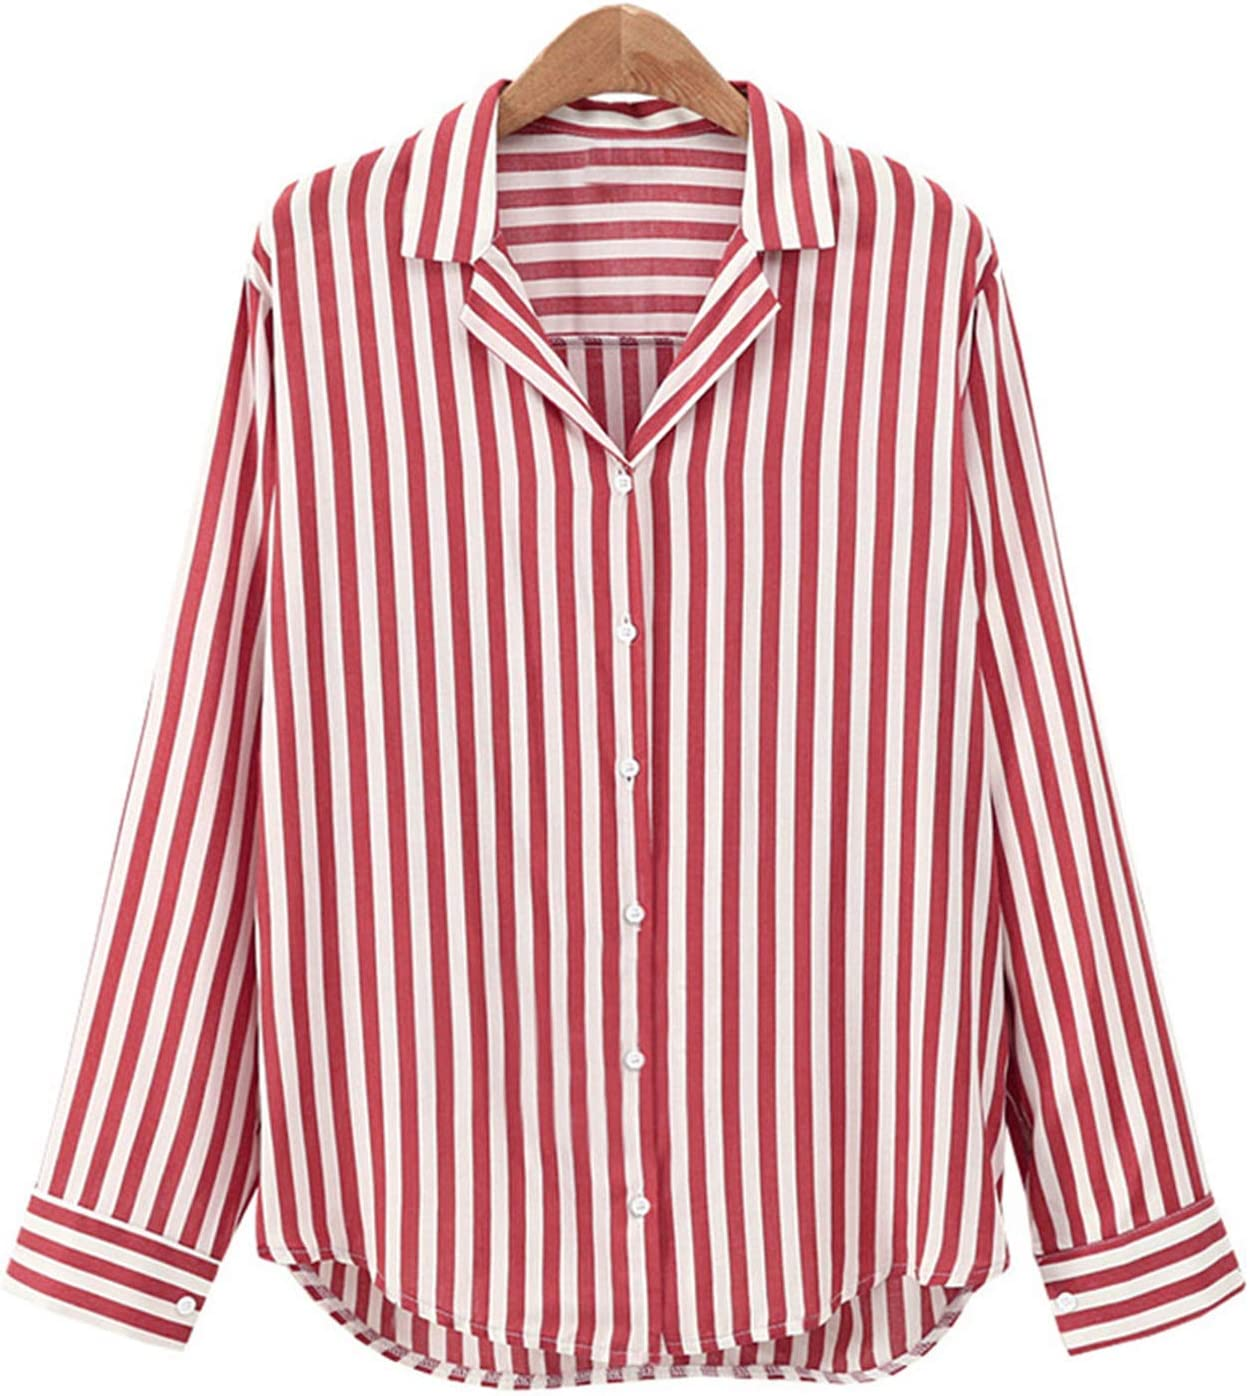 T T Store Blusas Blusas Blusas Blusa Elegante de Negocios ...